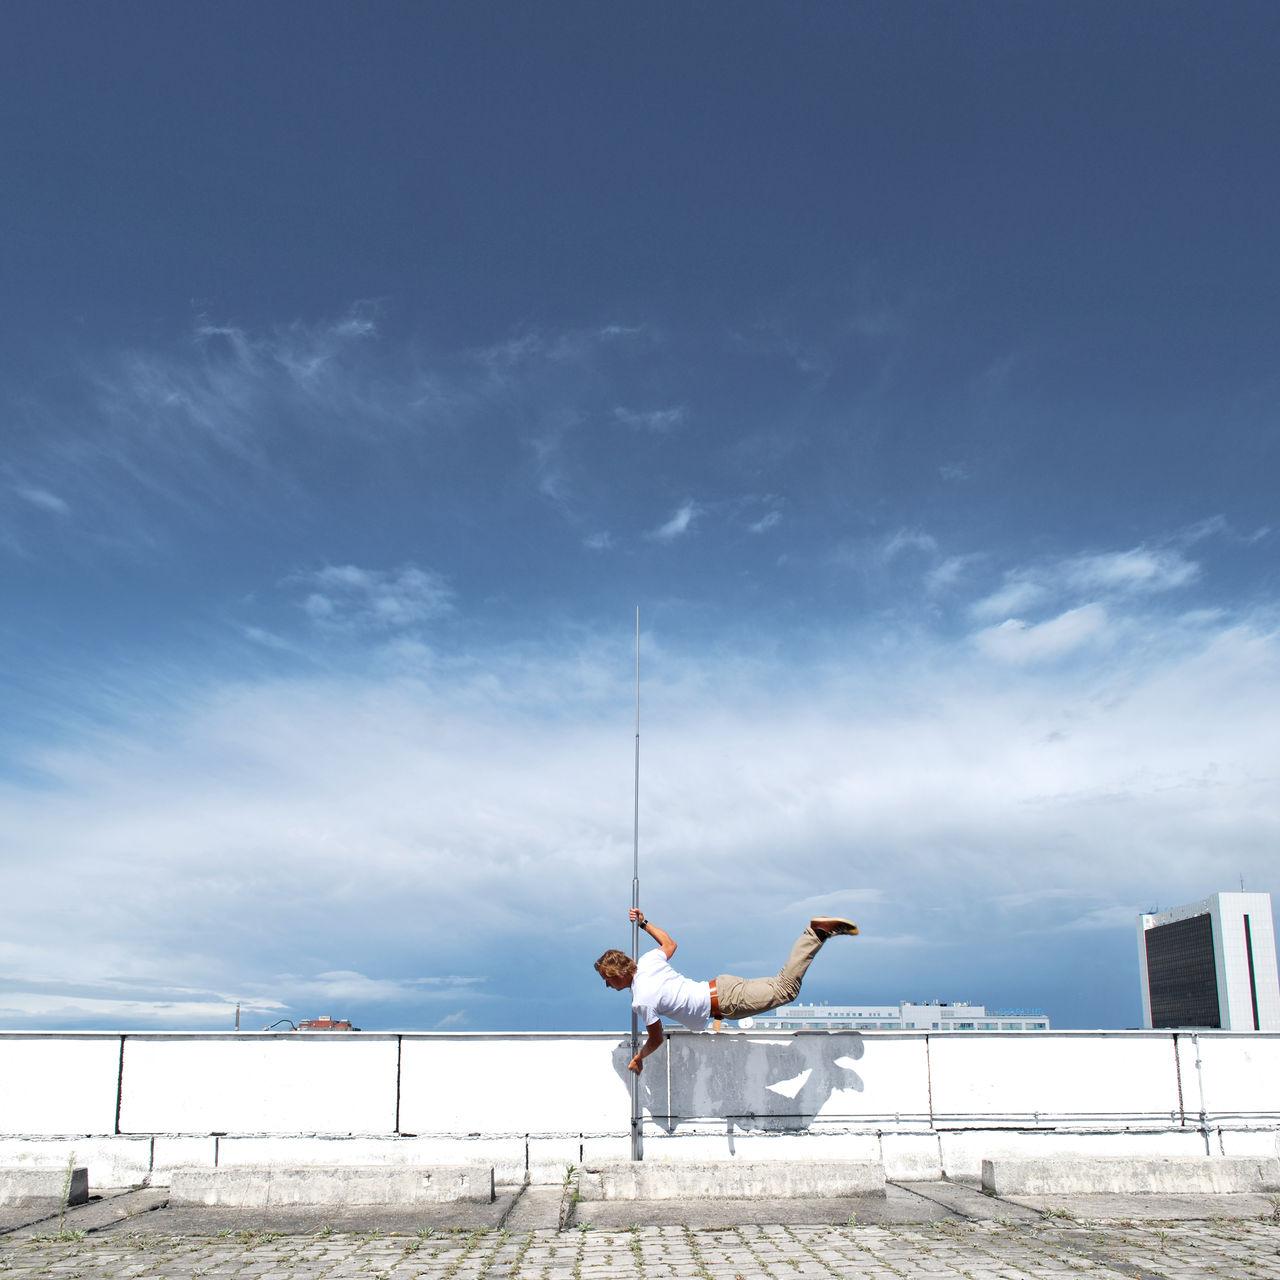 Man Balancing On Pole Against Sky